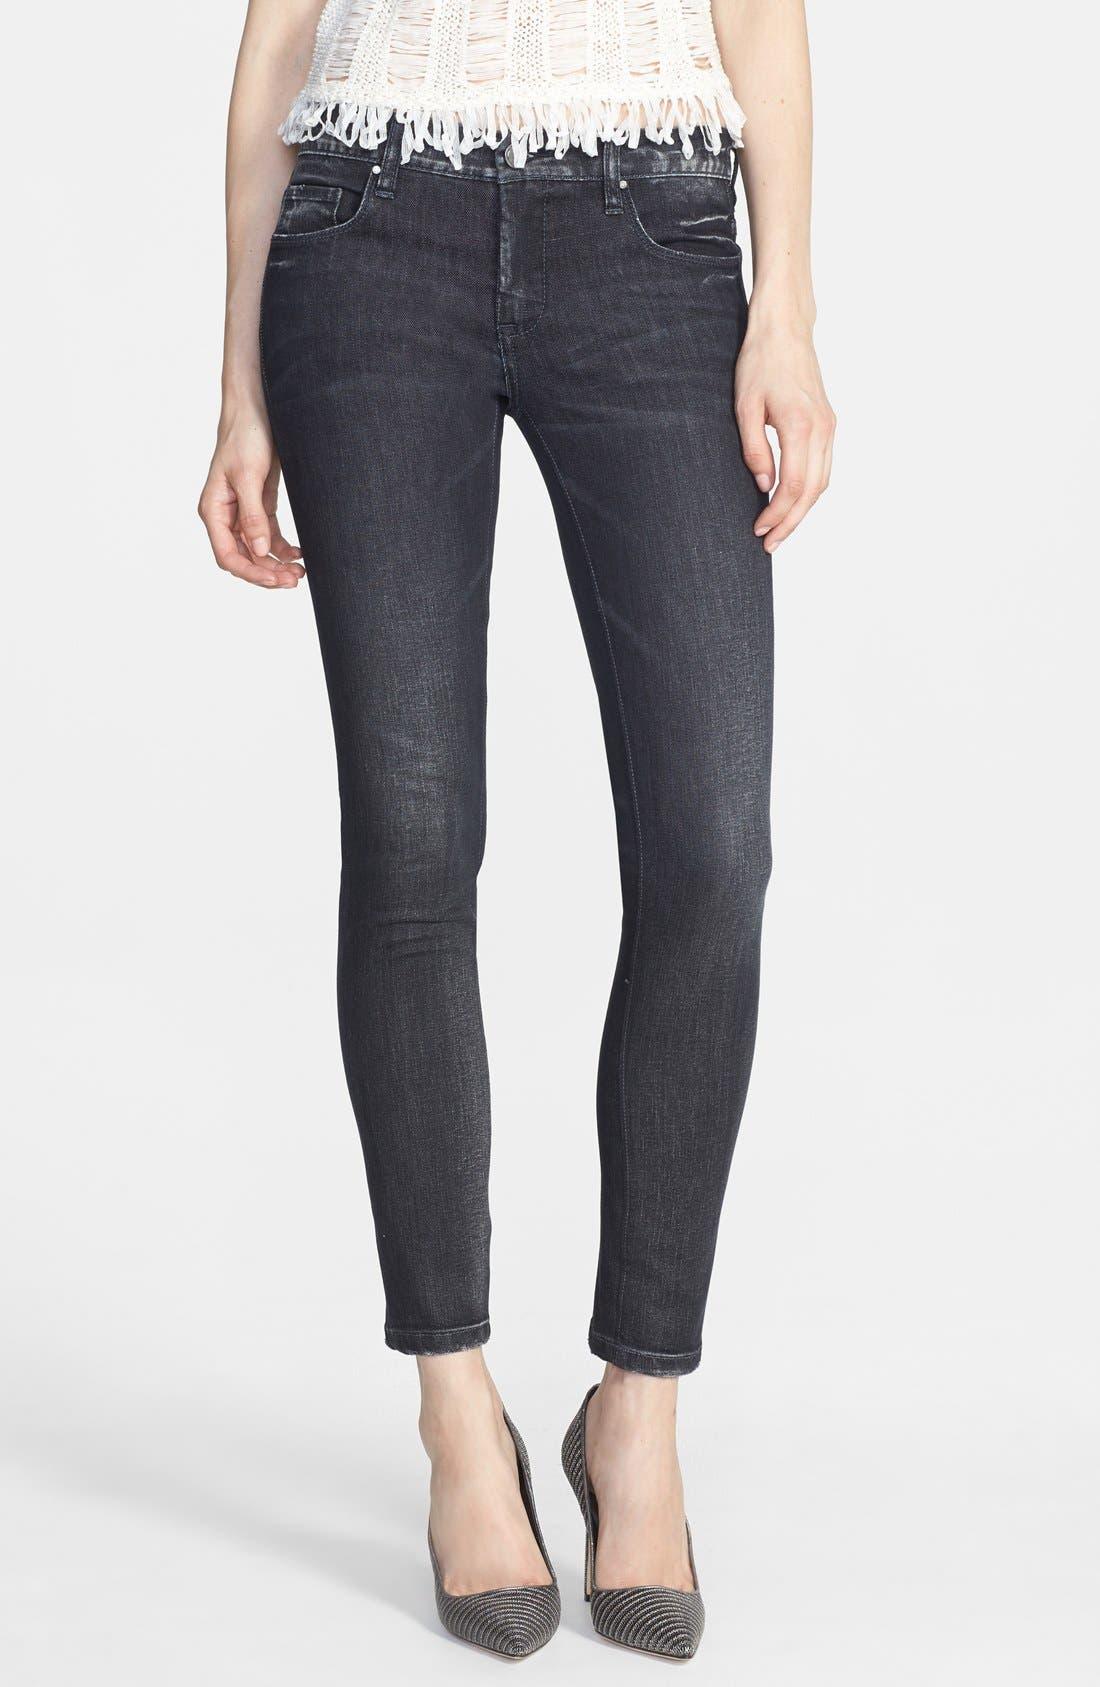 Alternate Image 1 Selected - BLANKNYC Skinny Jeans (Grey Area Anatomy)